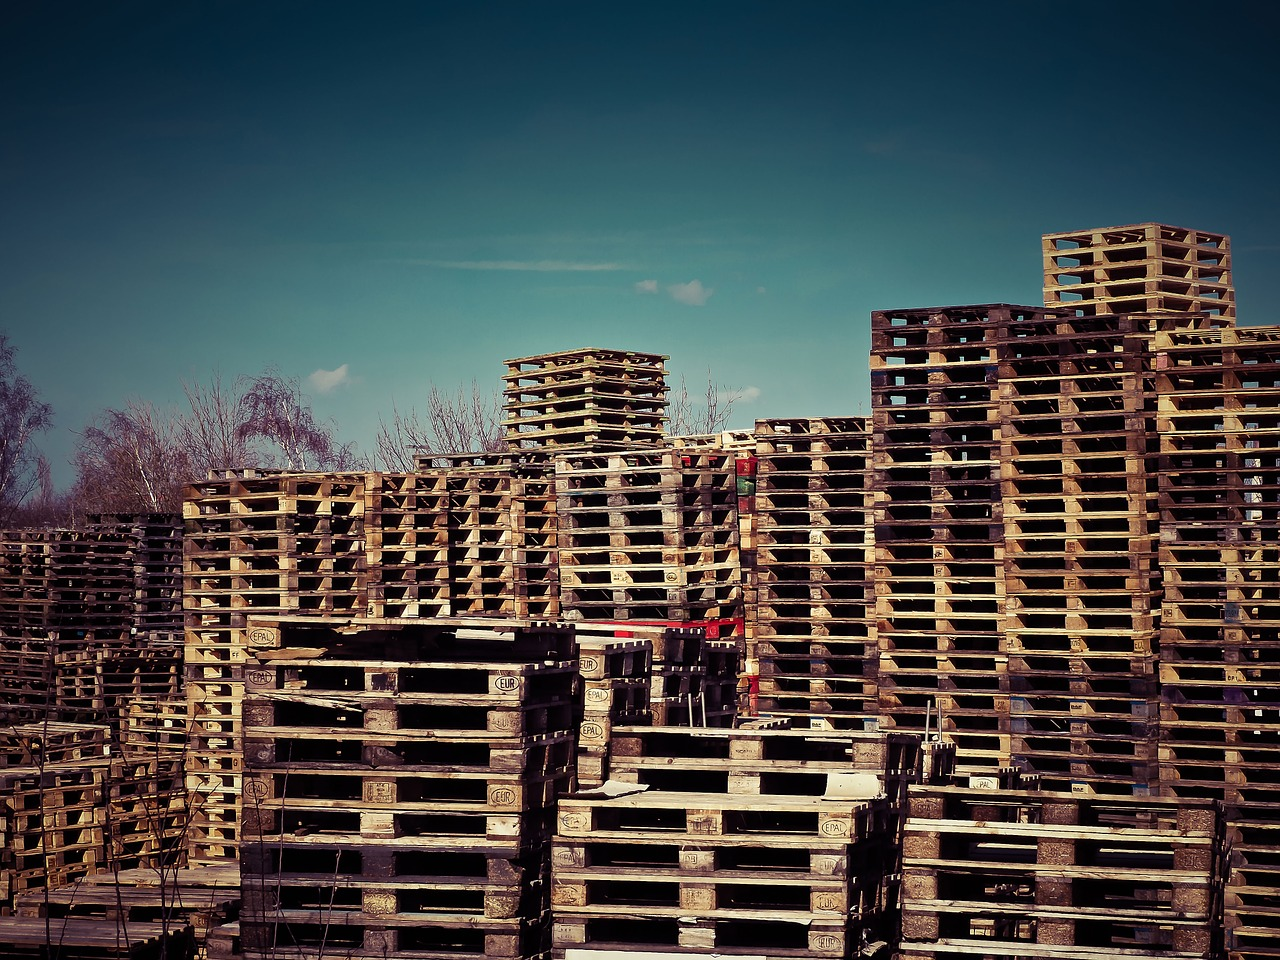 wooden pallets, pallets, stack